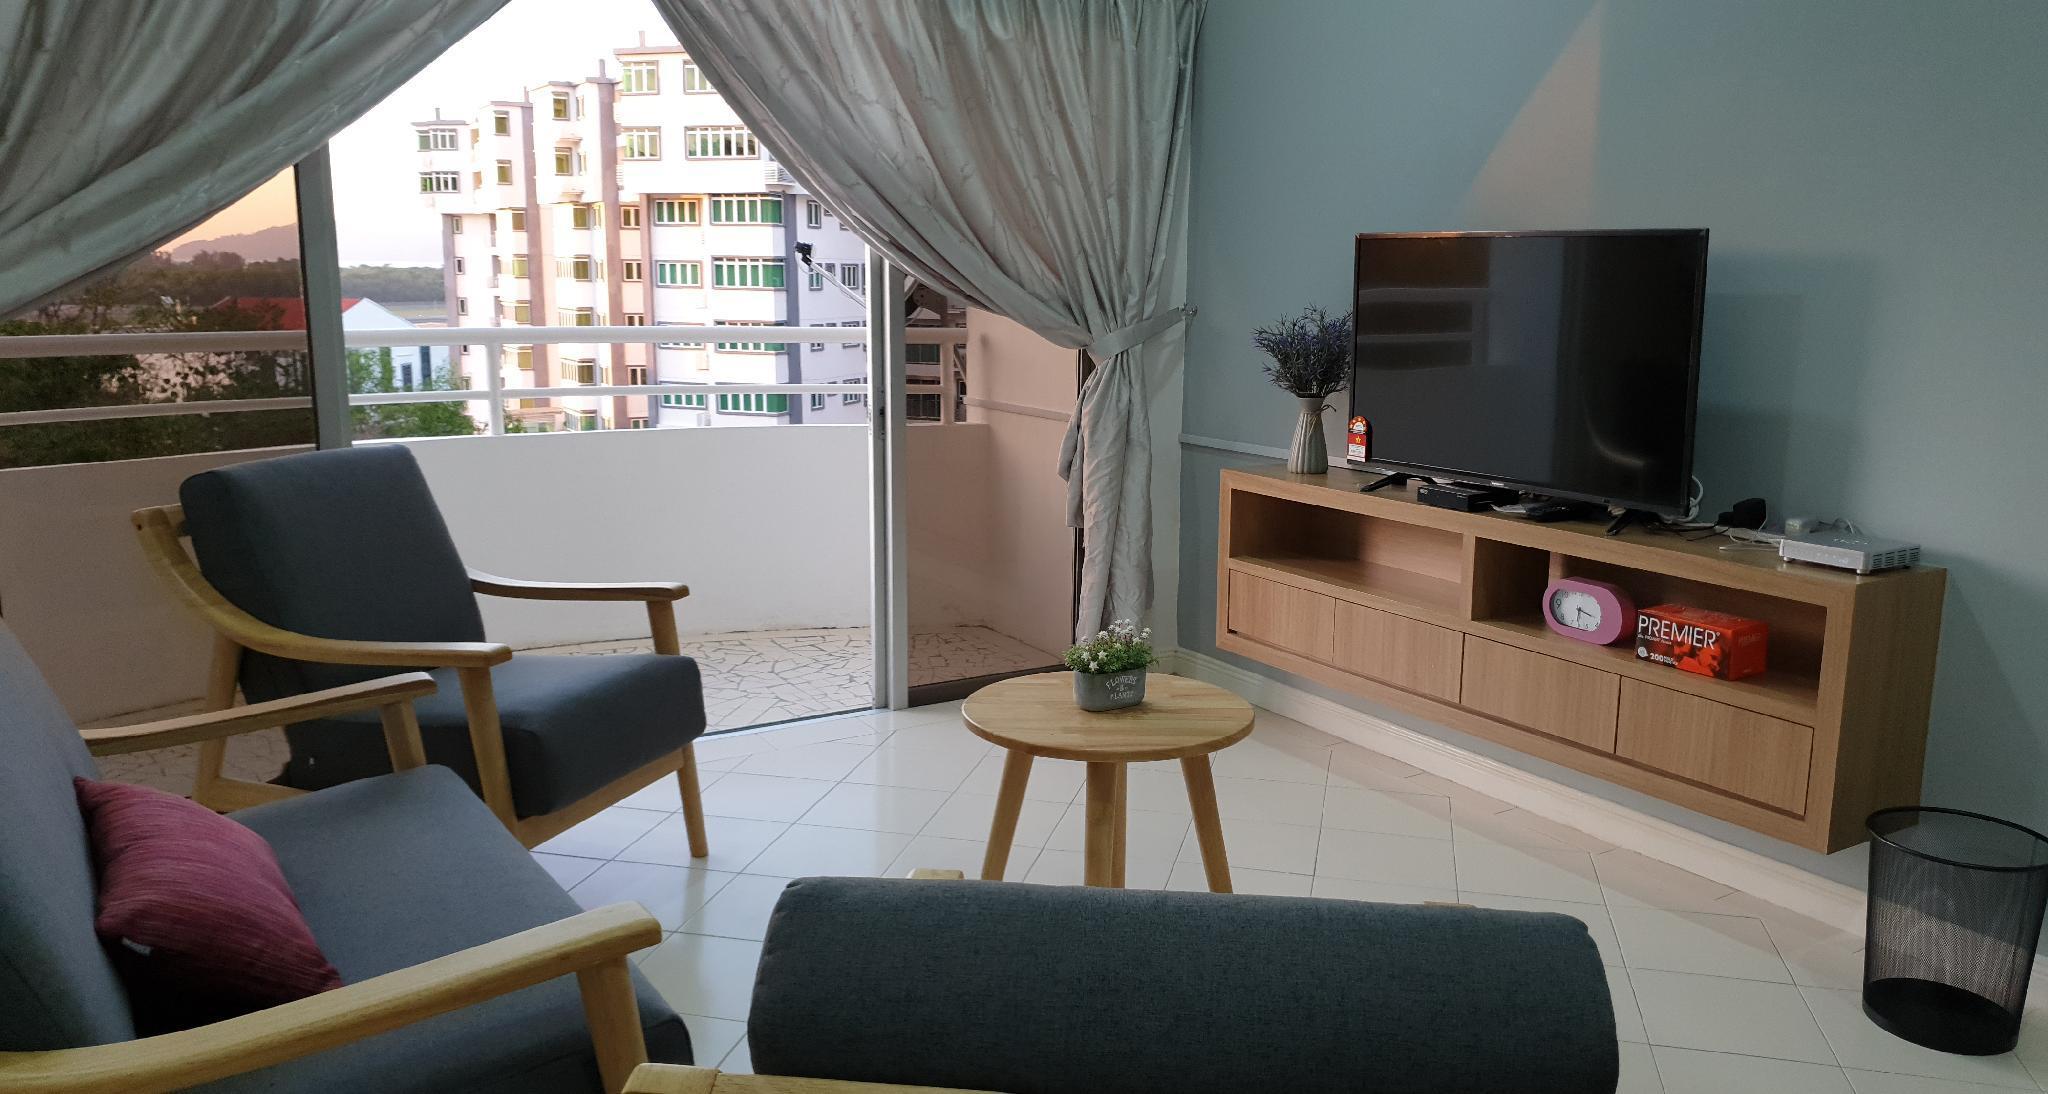 2. Tanjung Aru Luxury Condo. Comfortandconvenient